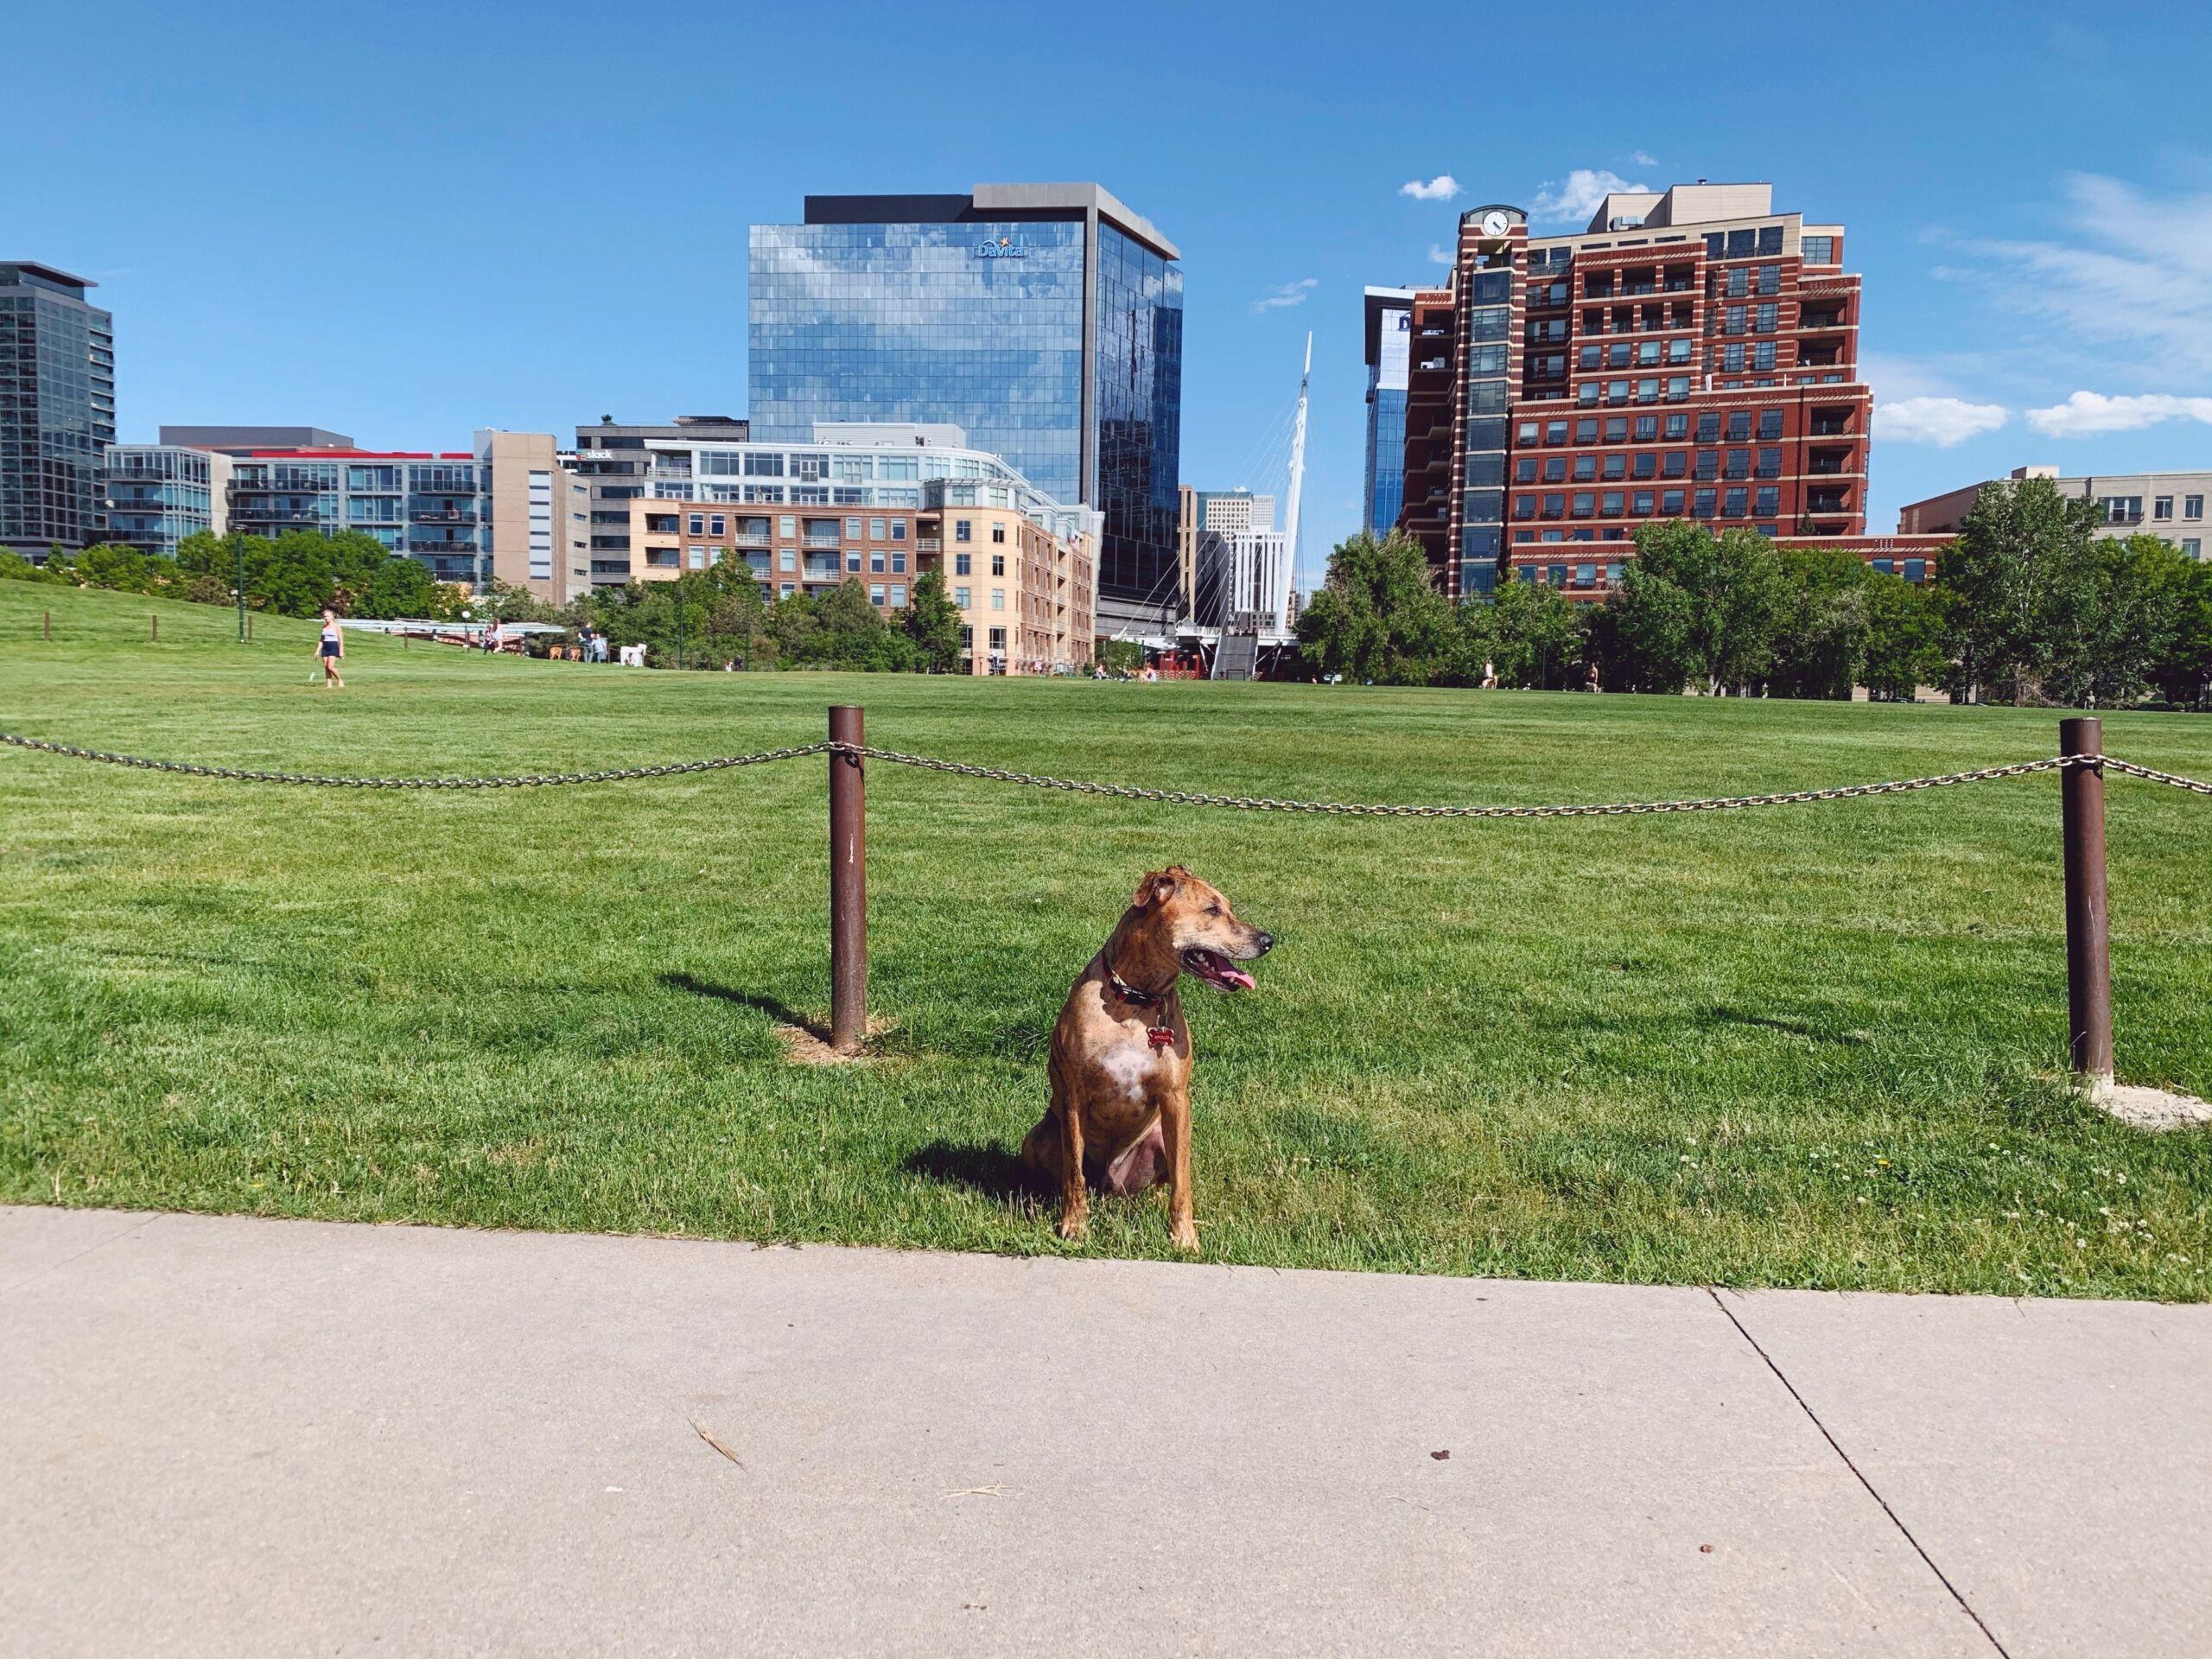 Dog at Confluence Park in Denver, Colorado